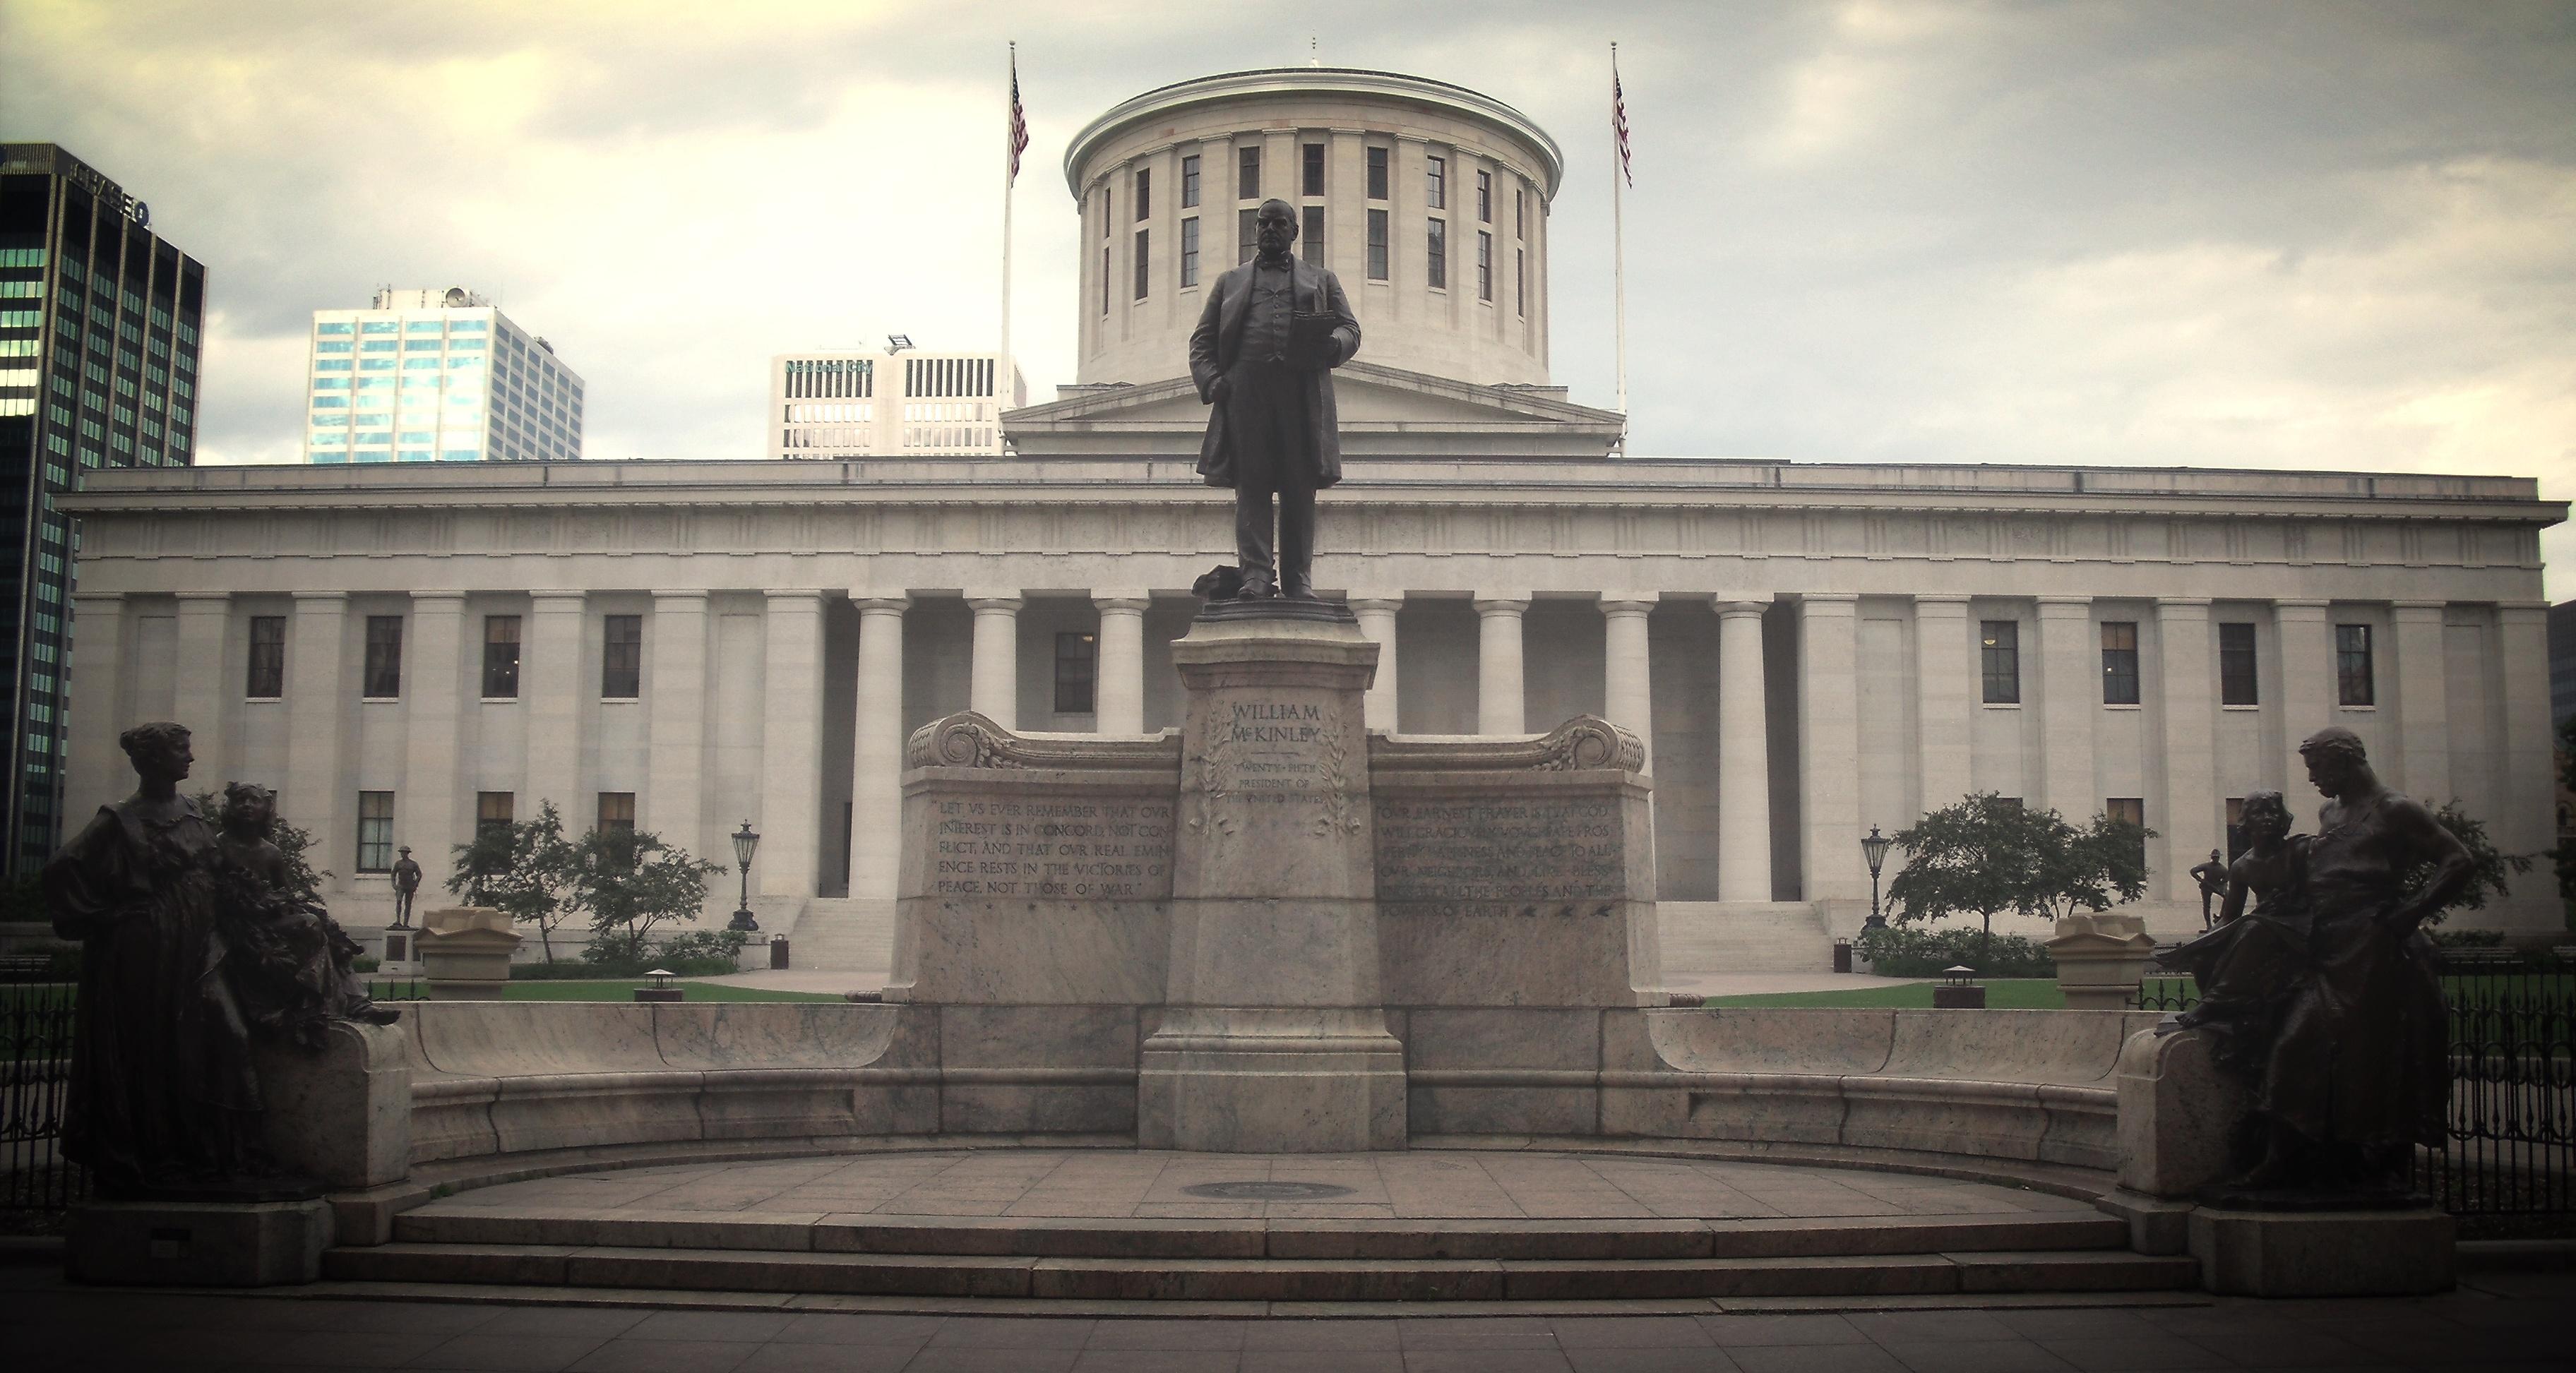 McKinley_Memorial_Ohio_Statehouse-1-007681-edited.jpg